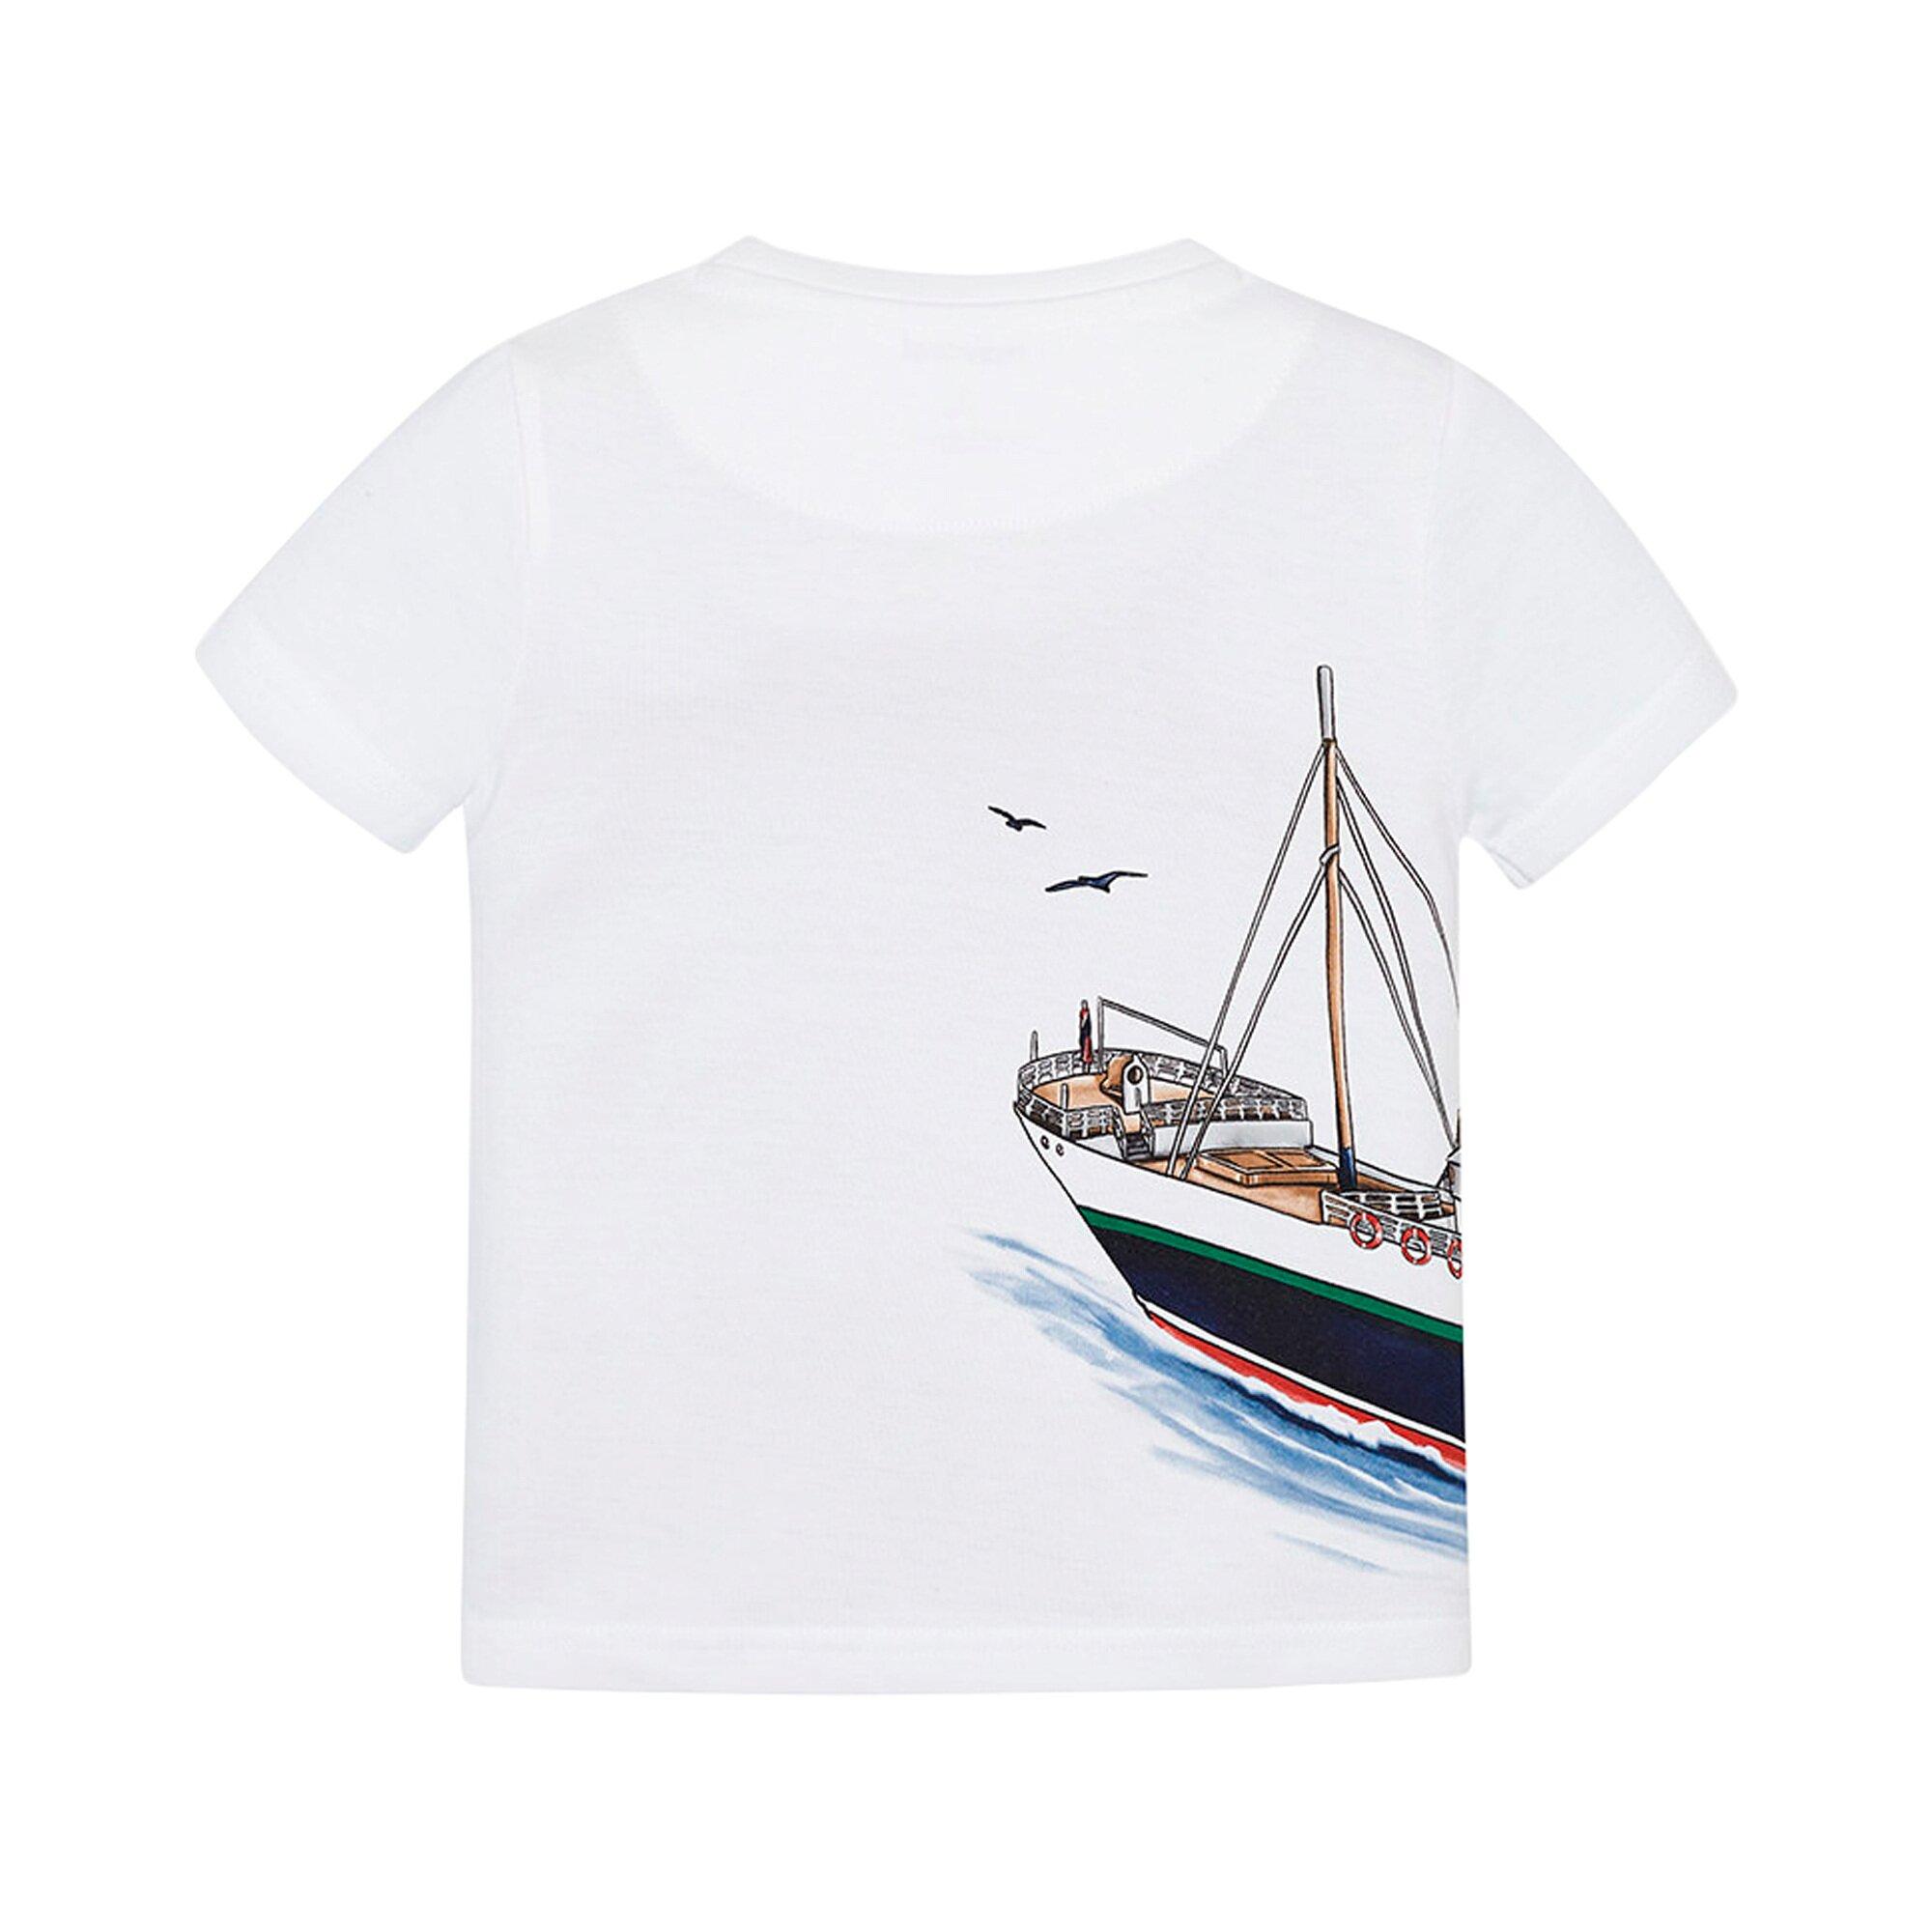 mayoral-t-shirt-schiff